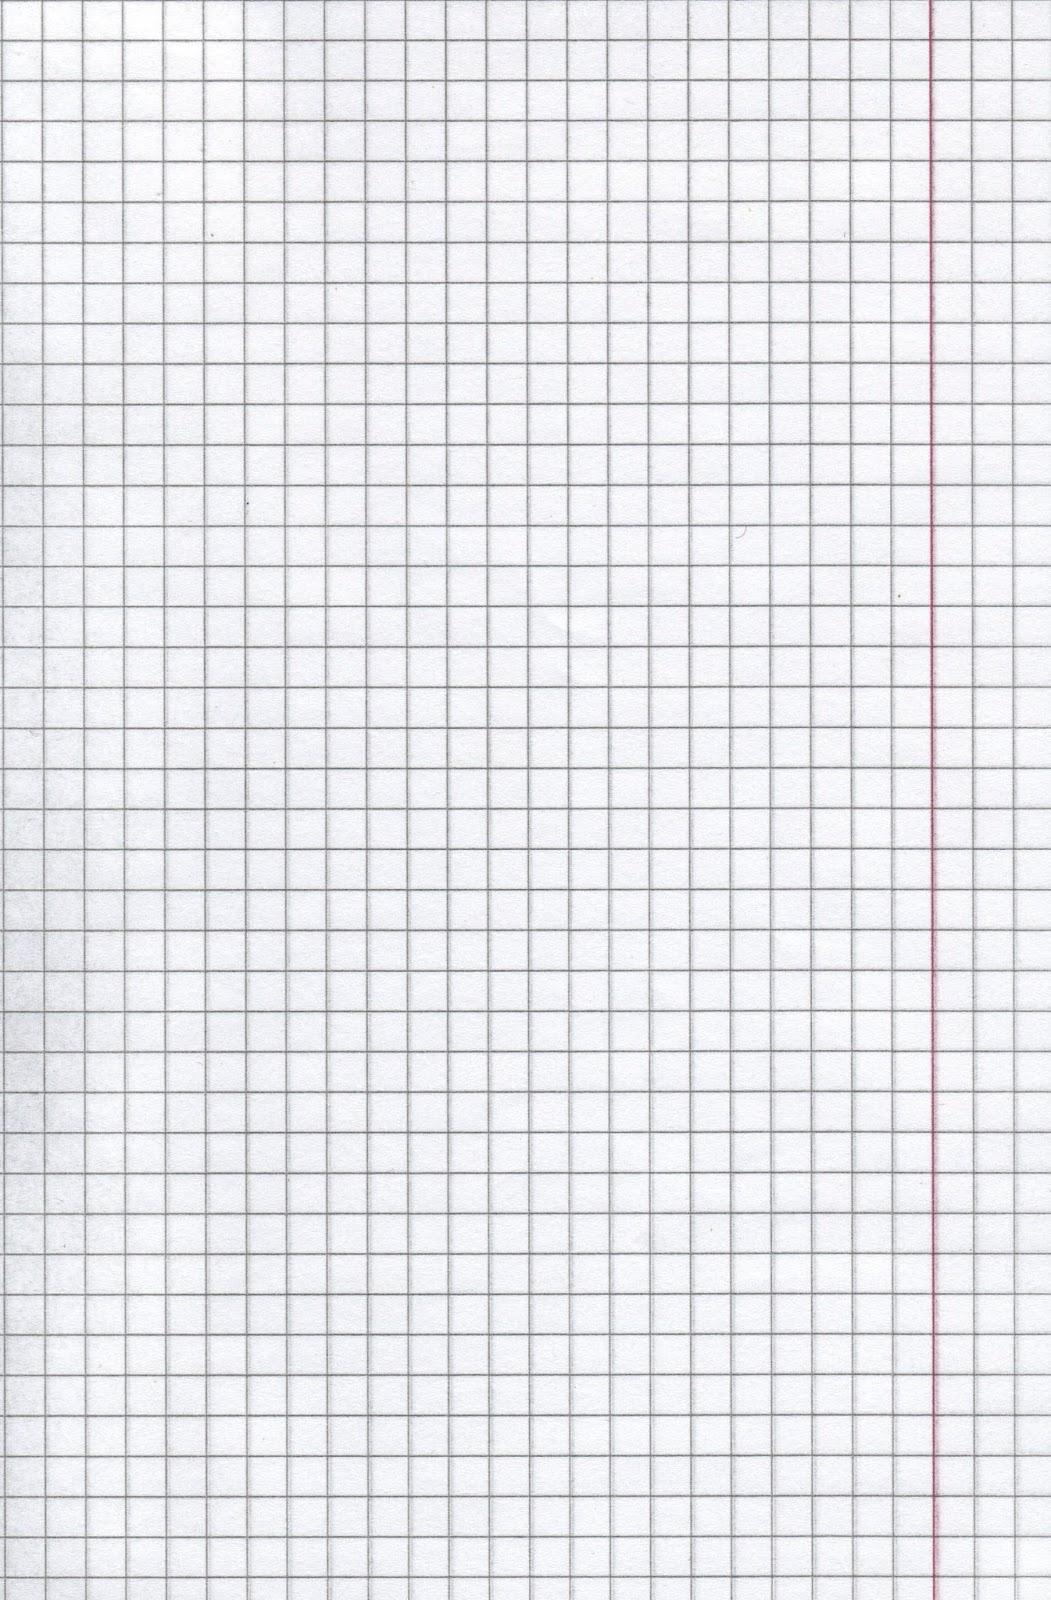 Set Of 7 Paper Textures Texturise Free Seamless Textures